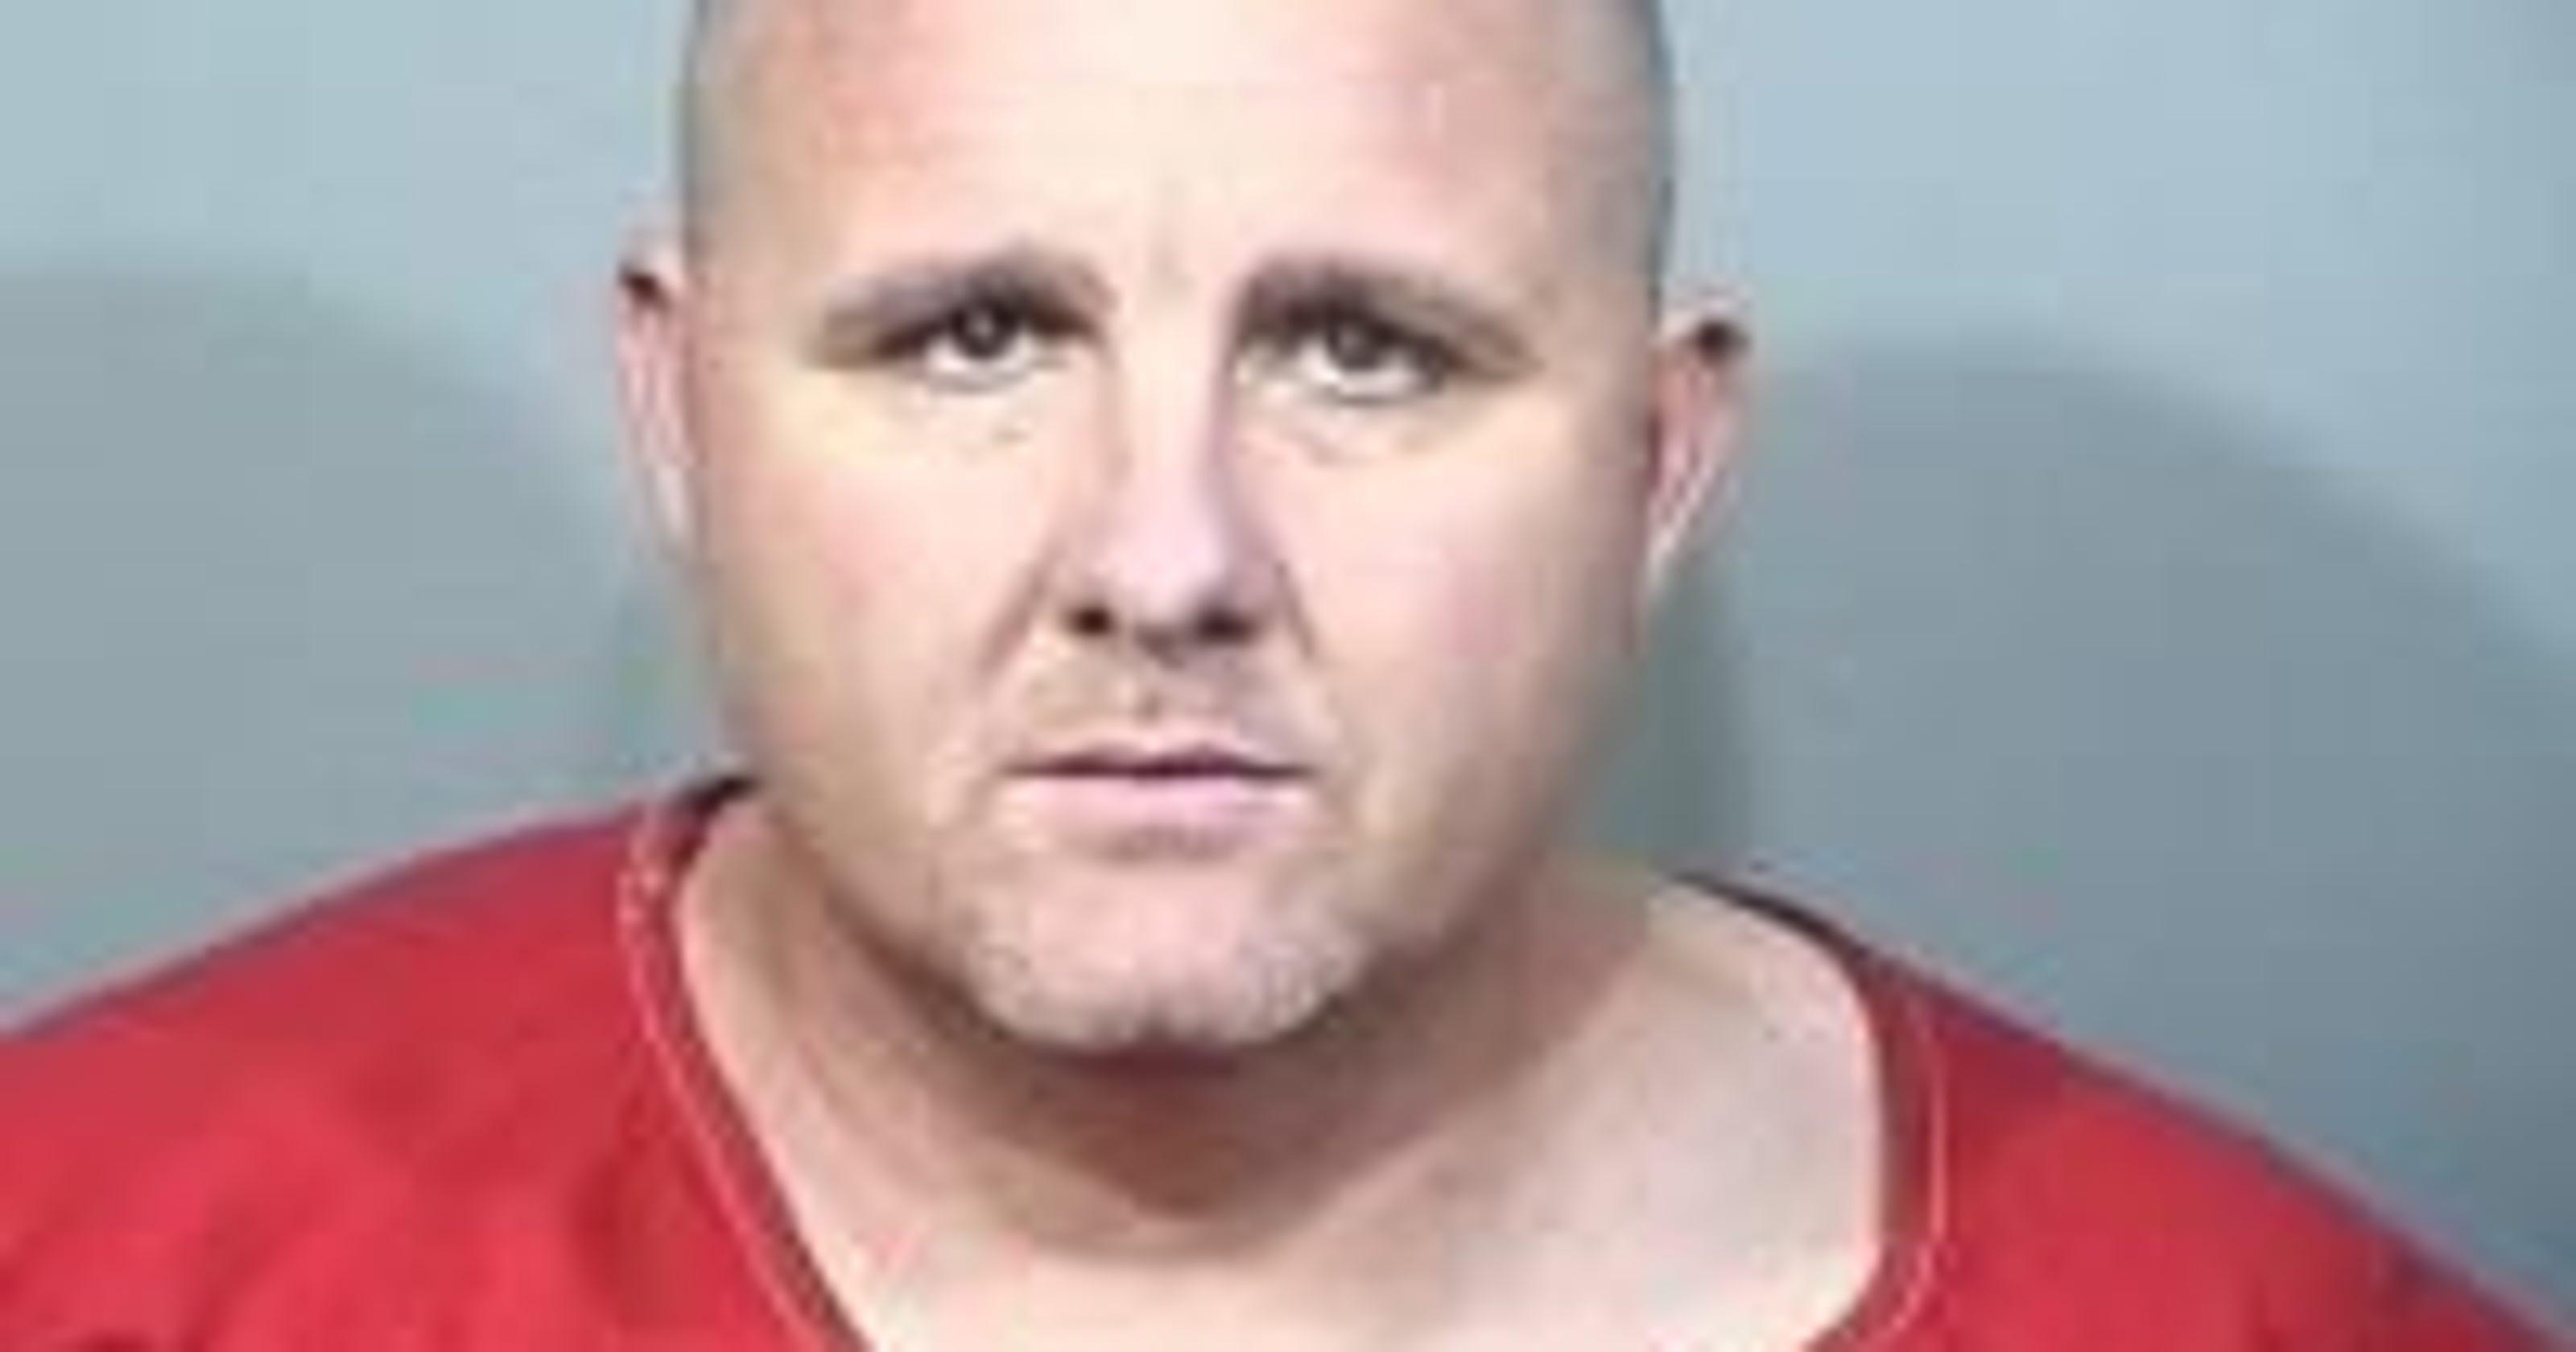 Police Sex Predator Booked In Titusville Scheme